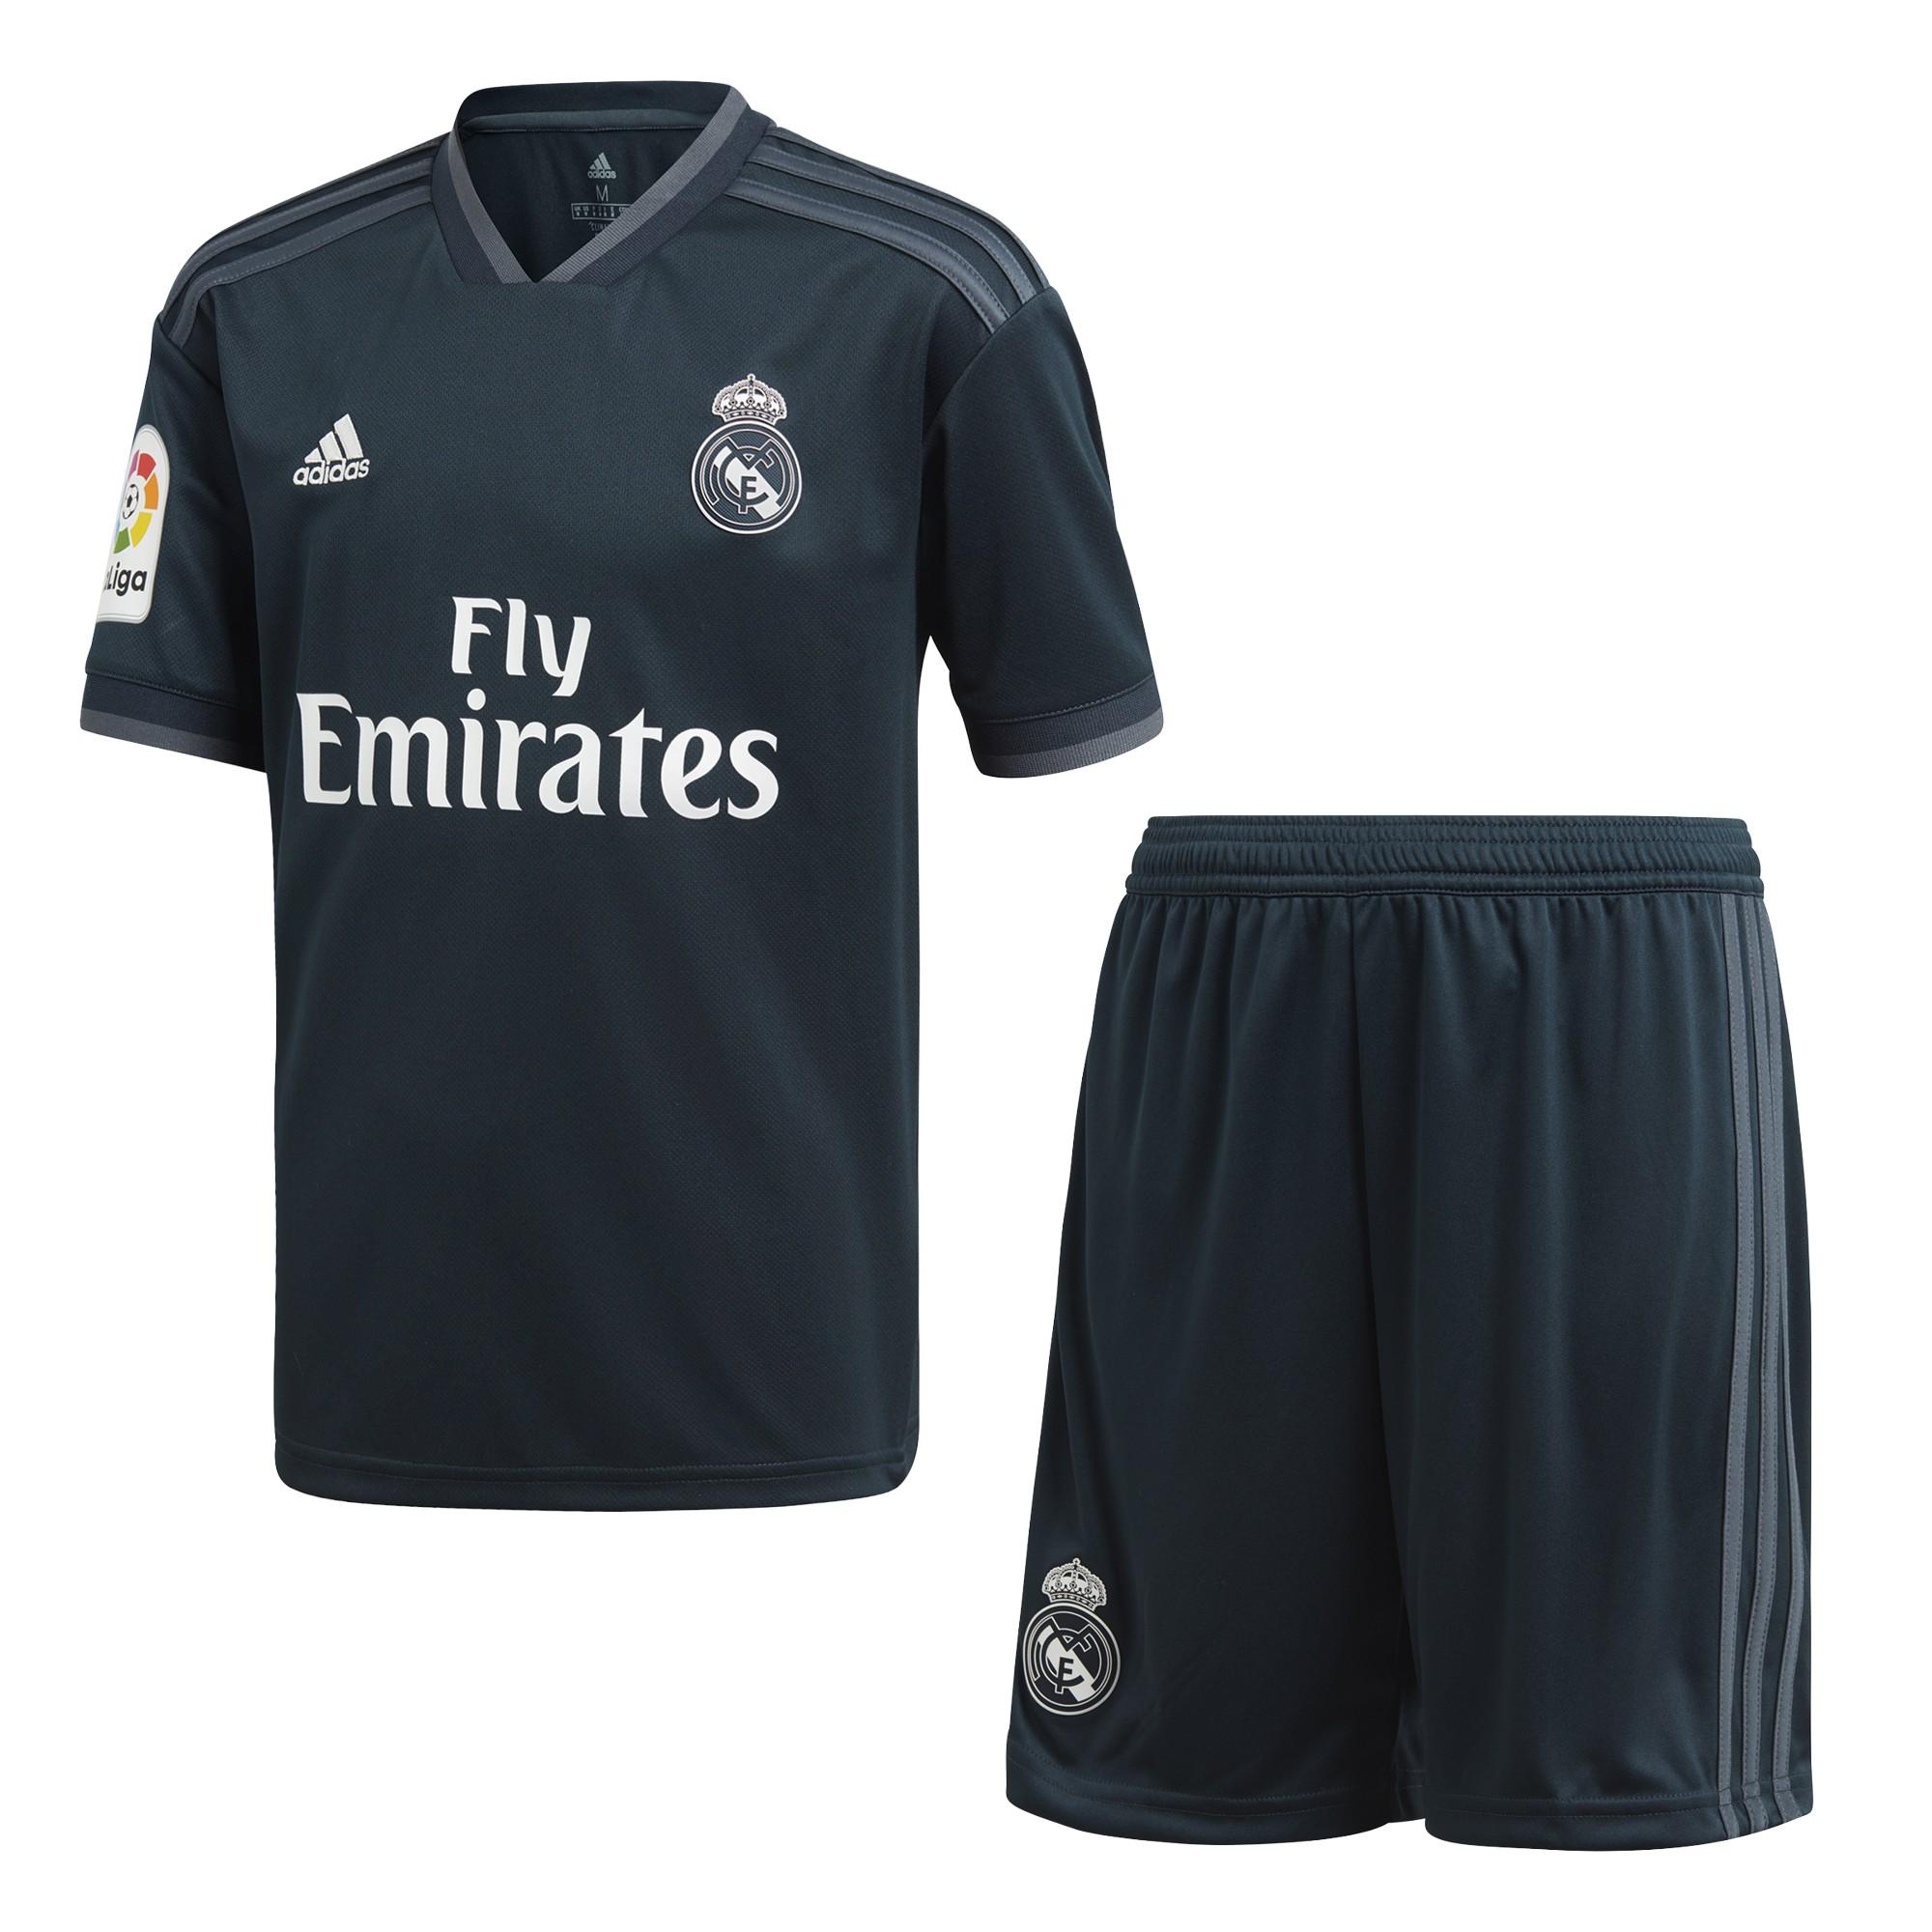 e7e98db2f31fe Conjunto adidas Real Madrid 18-19 Local CG0569 - Deportes Manzanedo